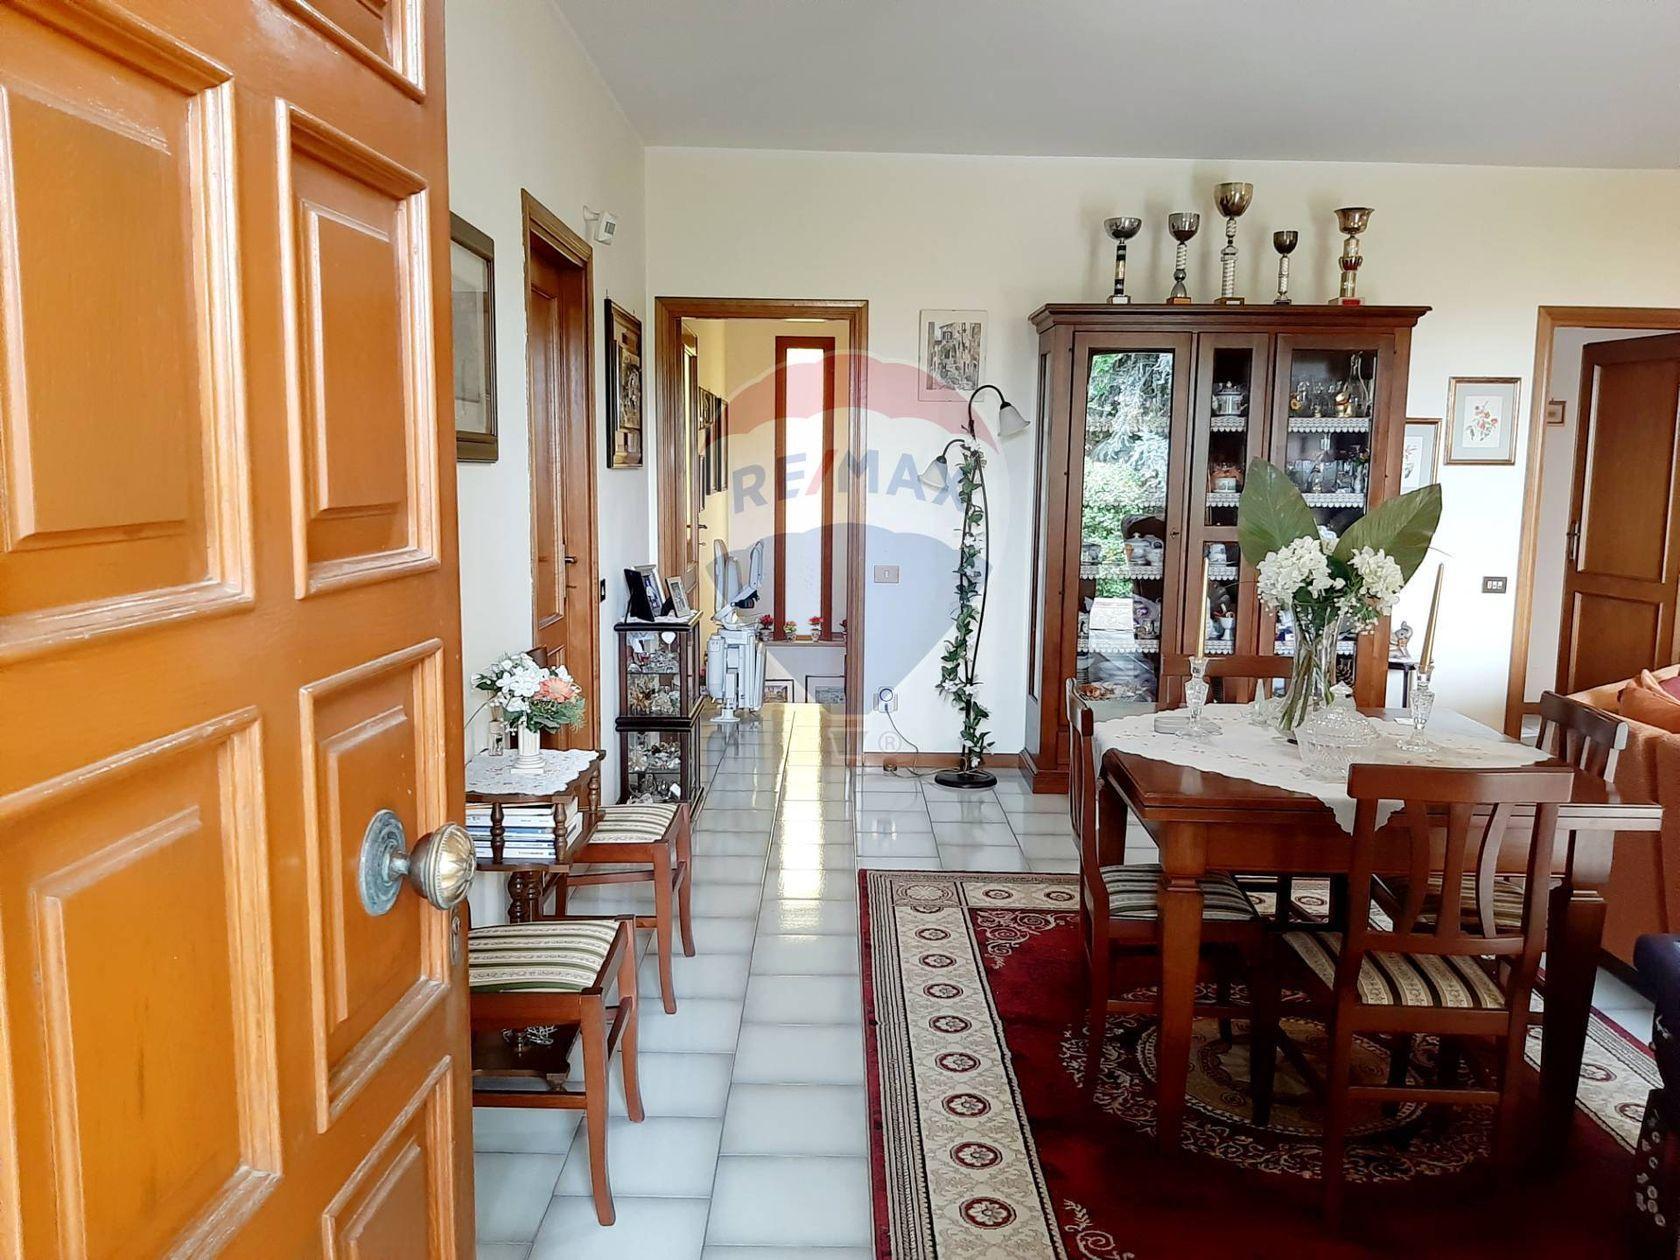 Villa singola Ardea - Nuova Florida, Ardea, RM Vendita - Foto 13